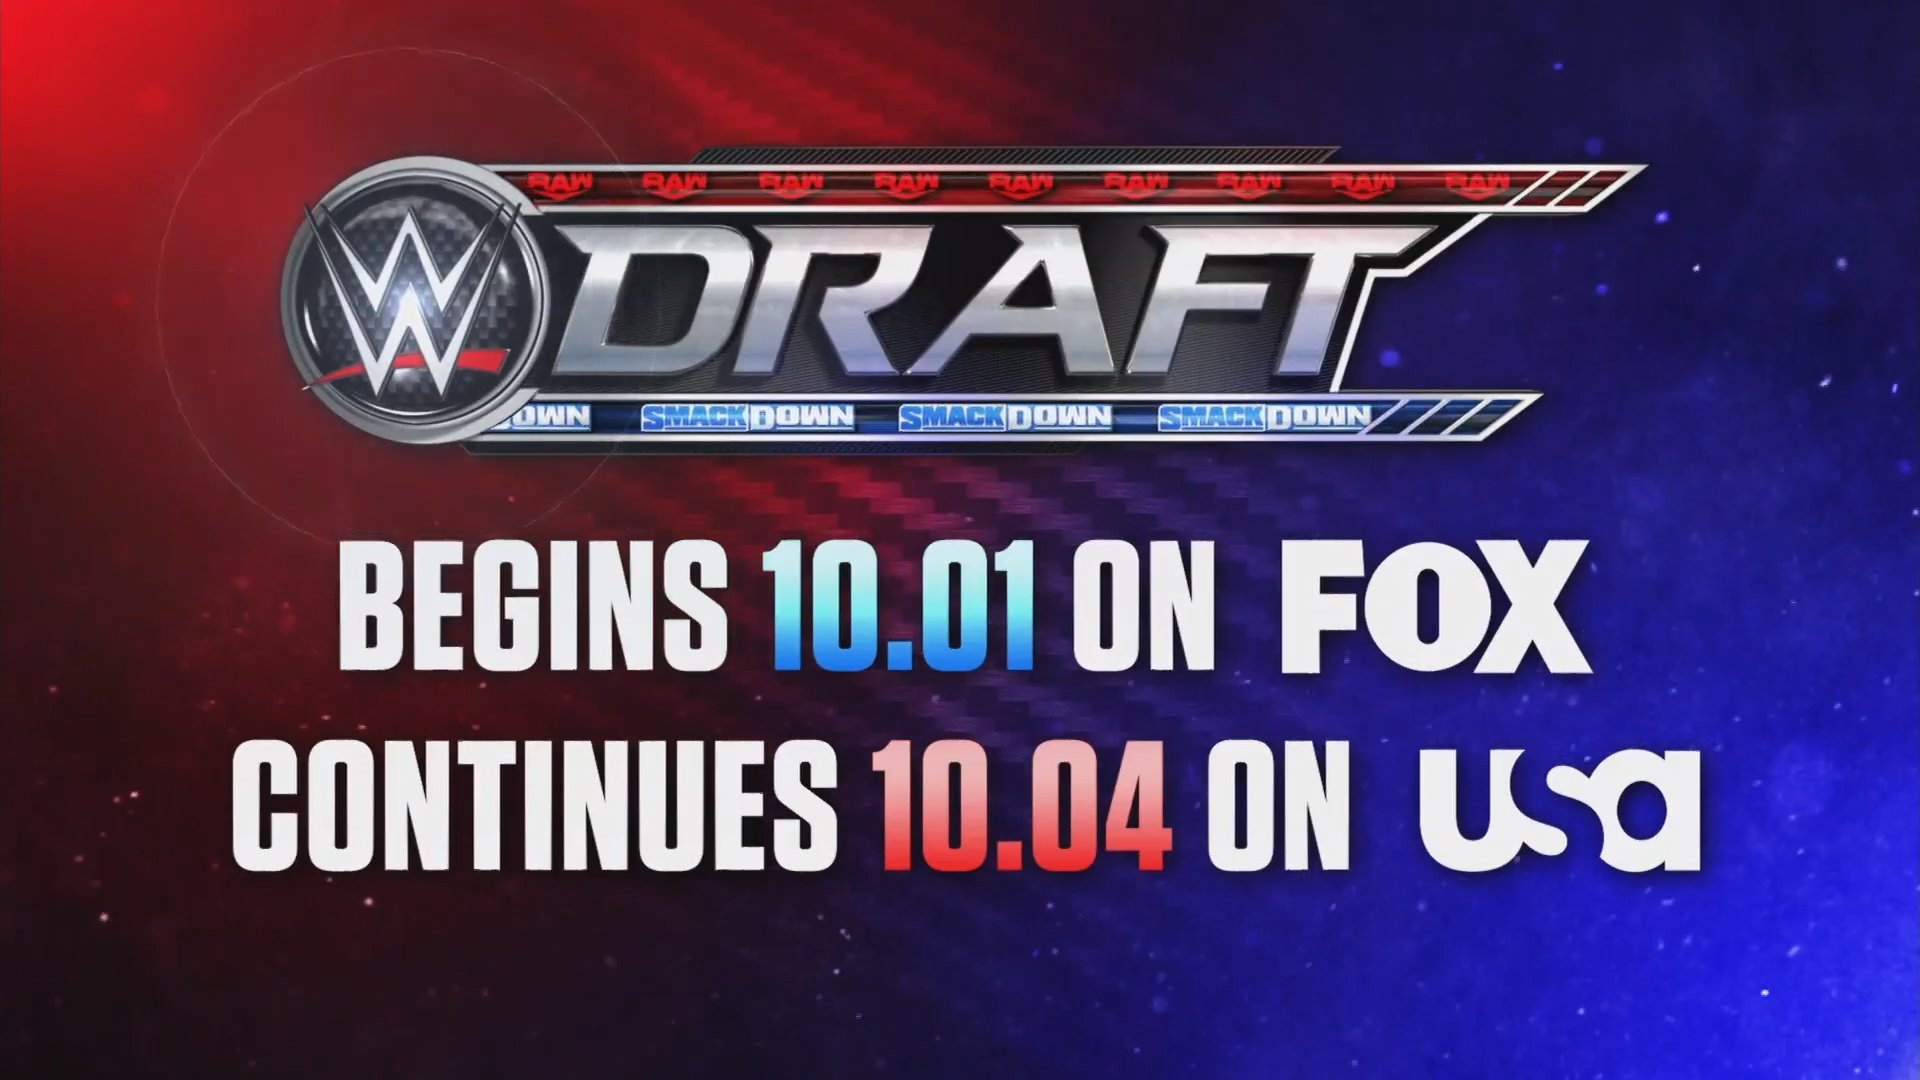 WWE Draft 2021 Confirmed To Return In October 1